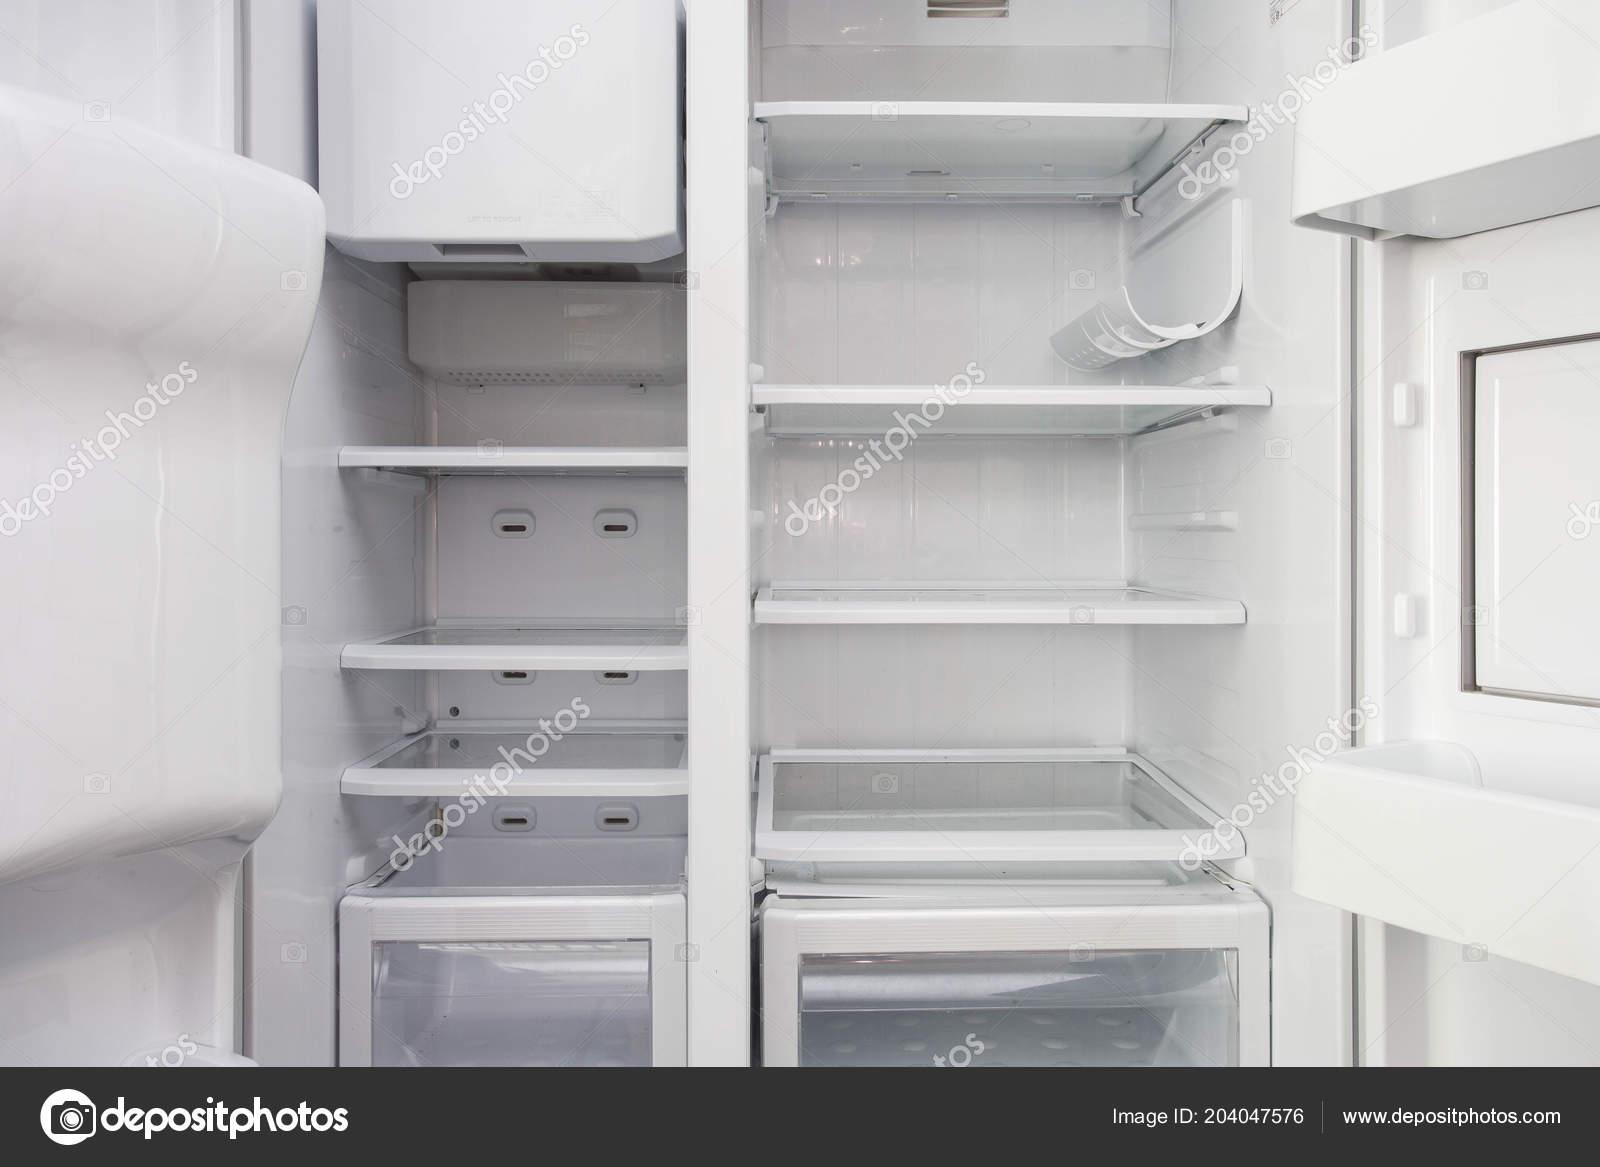 Aeg Customflex Kühlschrank : Aeg customflex kühlschrank innovation hat bei uns tradition aeg